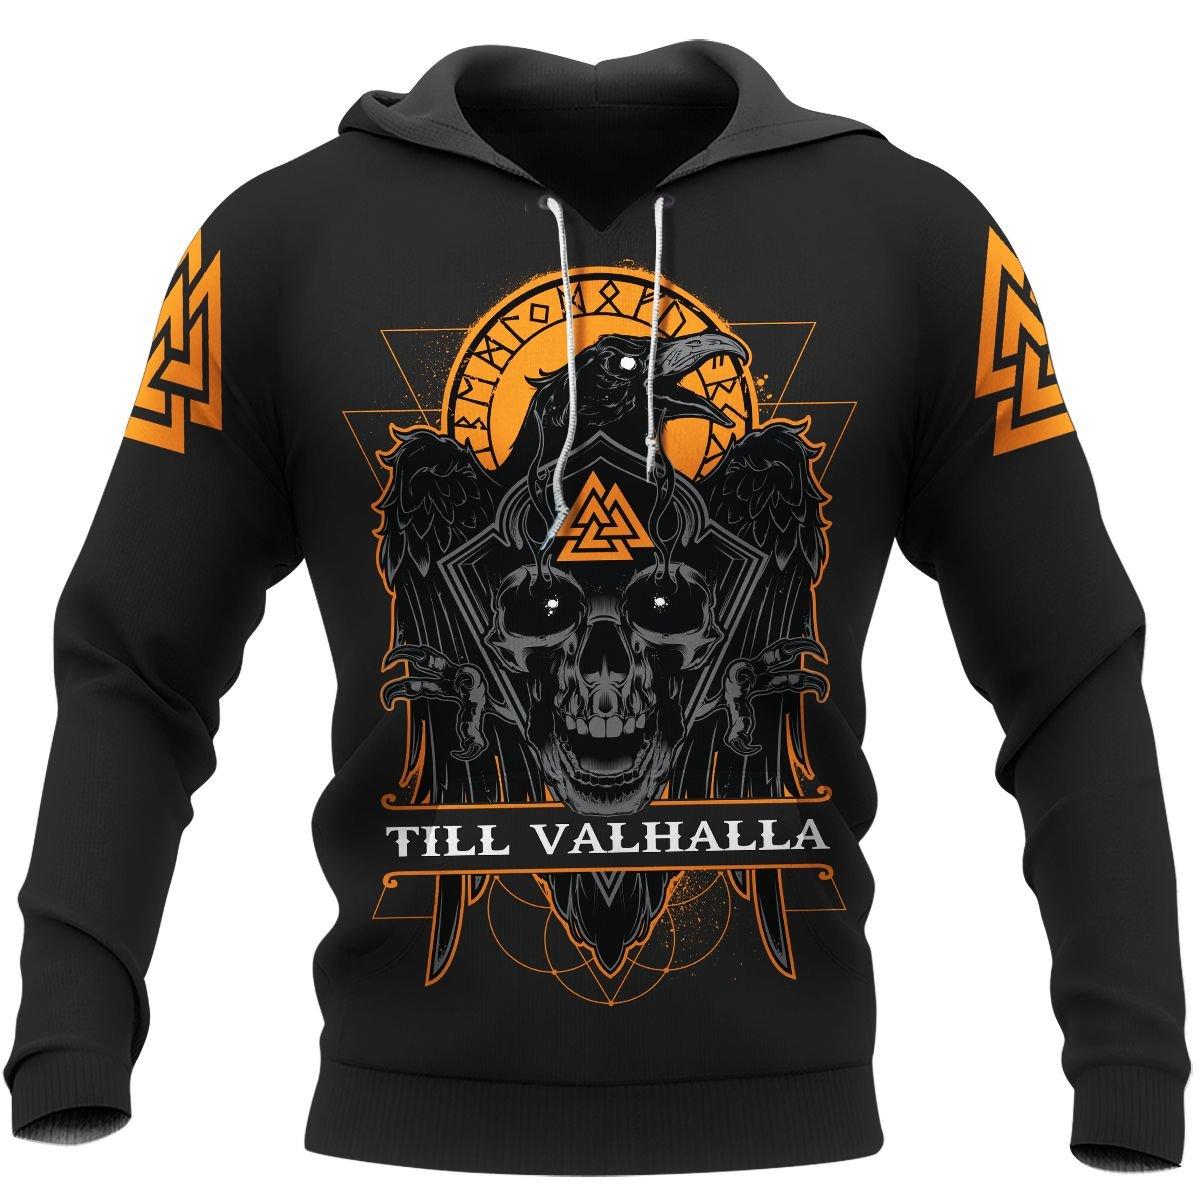 TILL VALHALLA RAVEN VIKING BLACK HOODIE